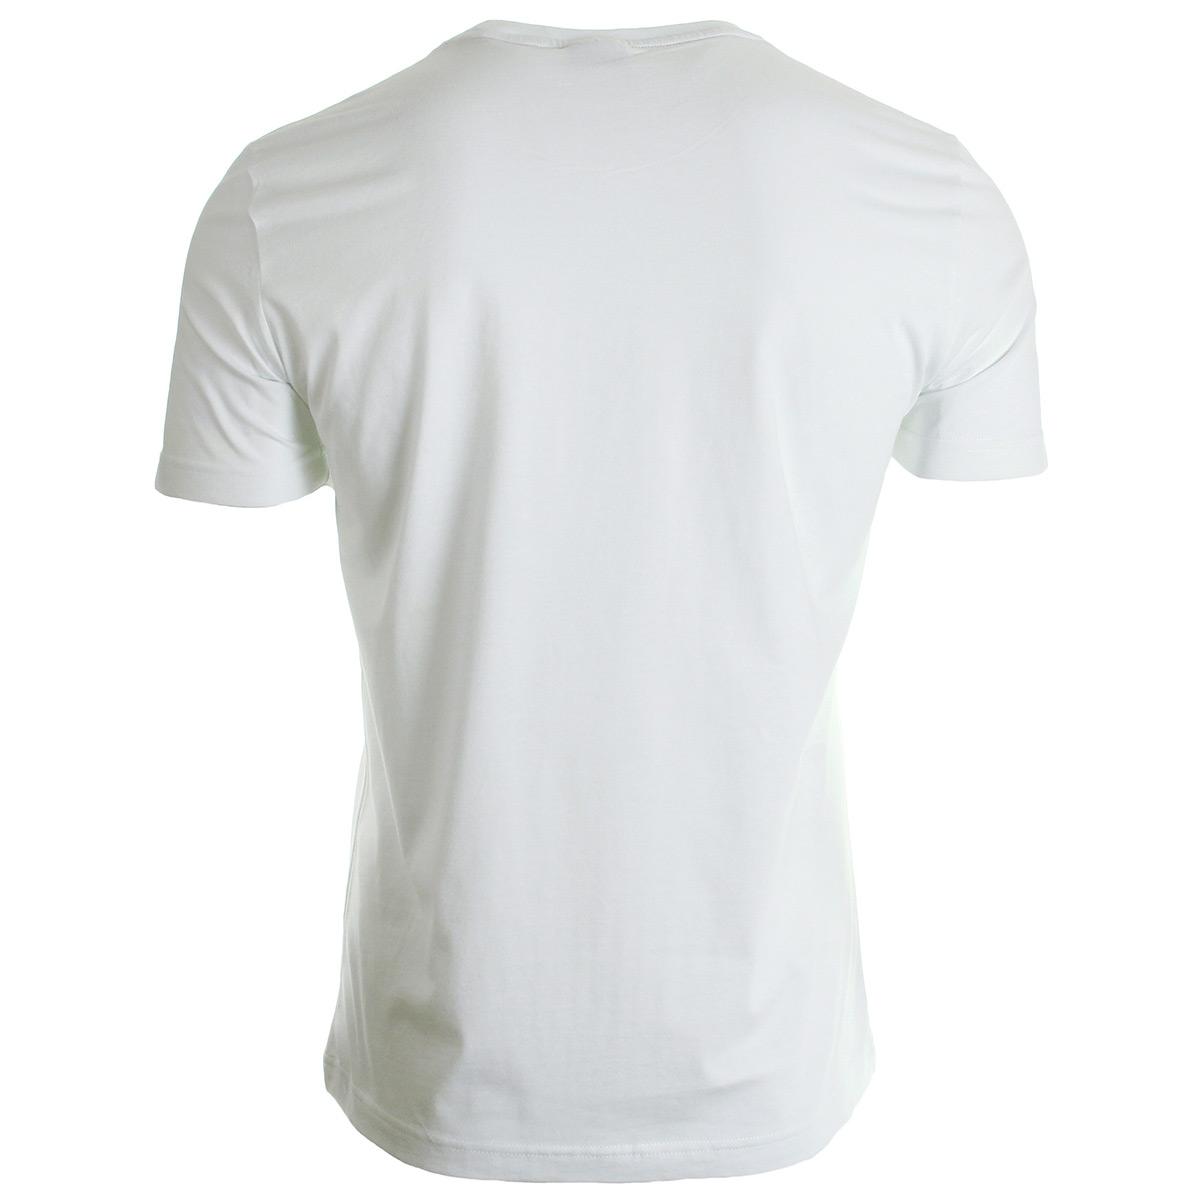 Le Coq Sportif Ess N°1 Tee White 1710348, T-Shirts homme